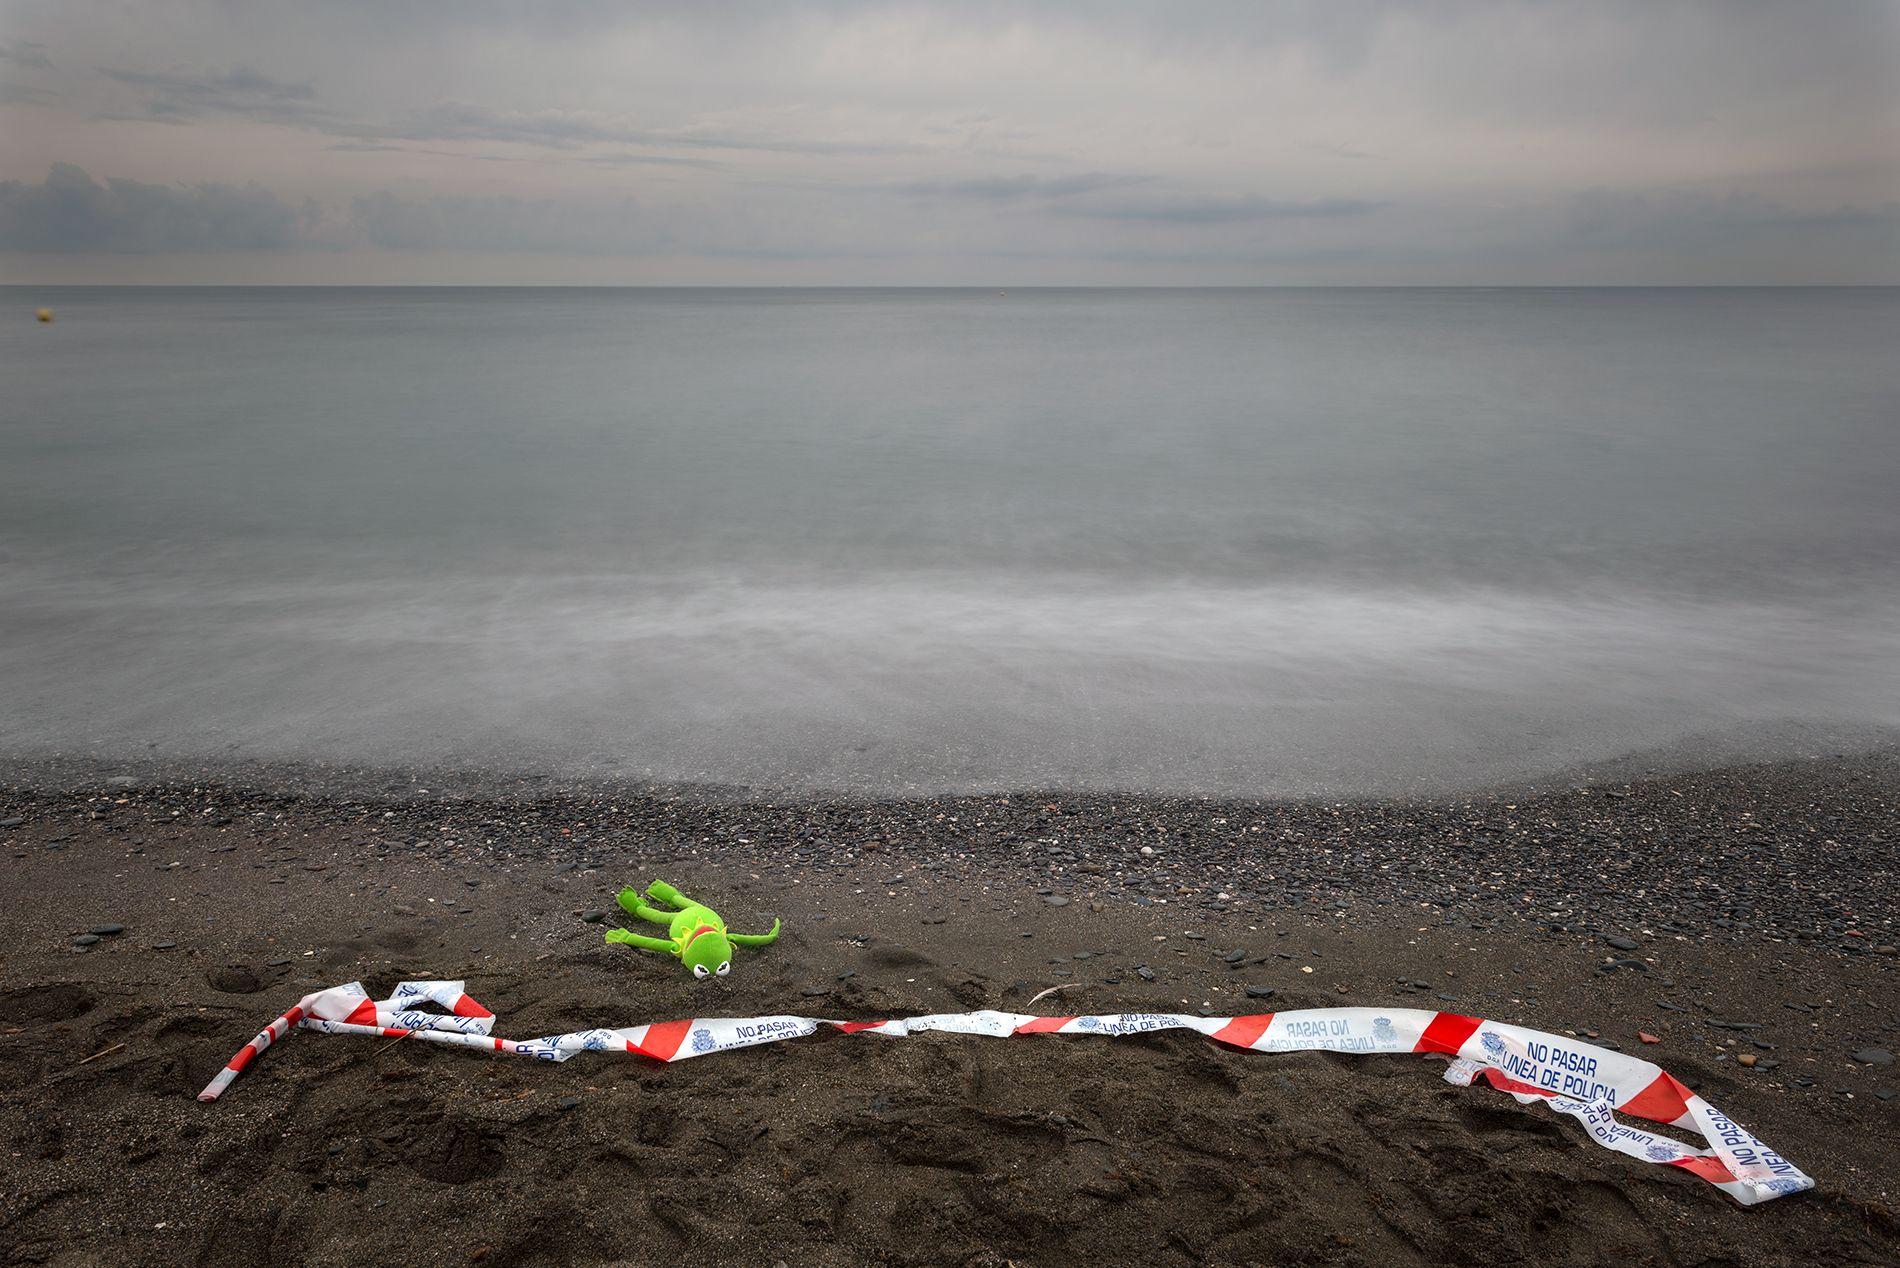 Asesinato a orillas del Mediterráneo